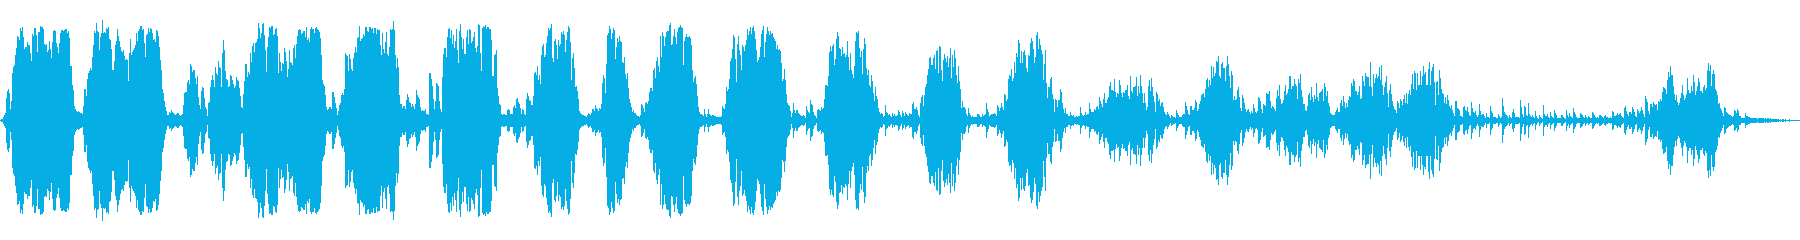 SPINNING METAL SQ...の再生済みの波形